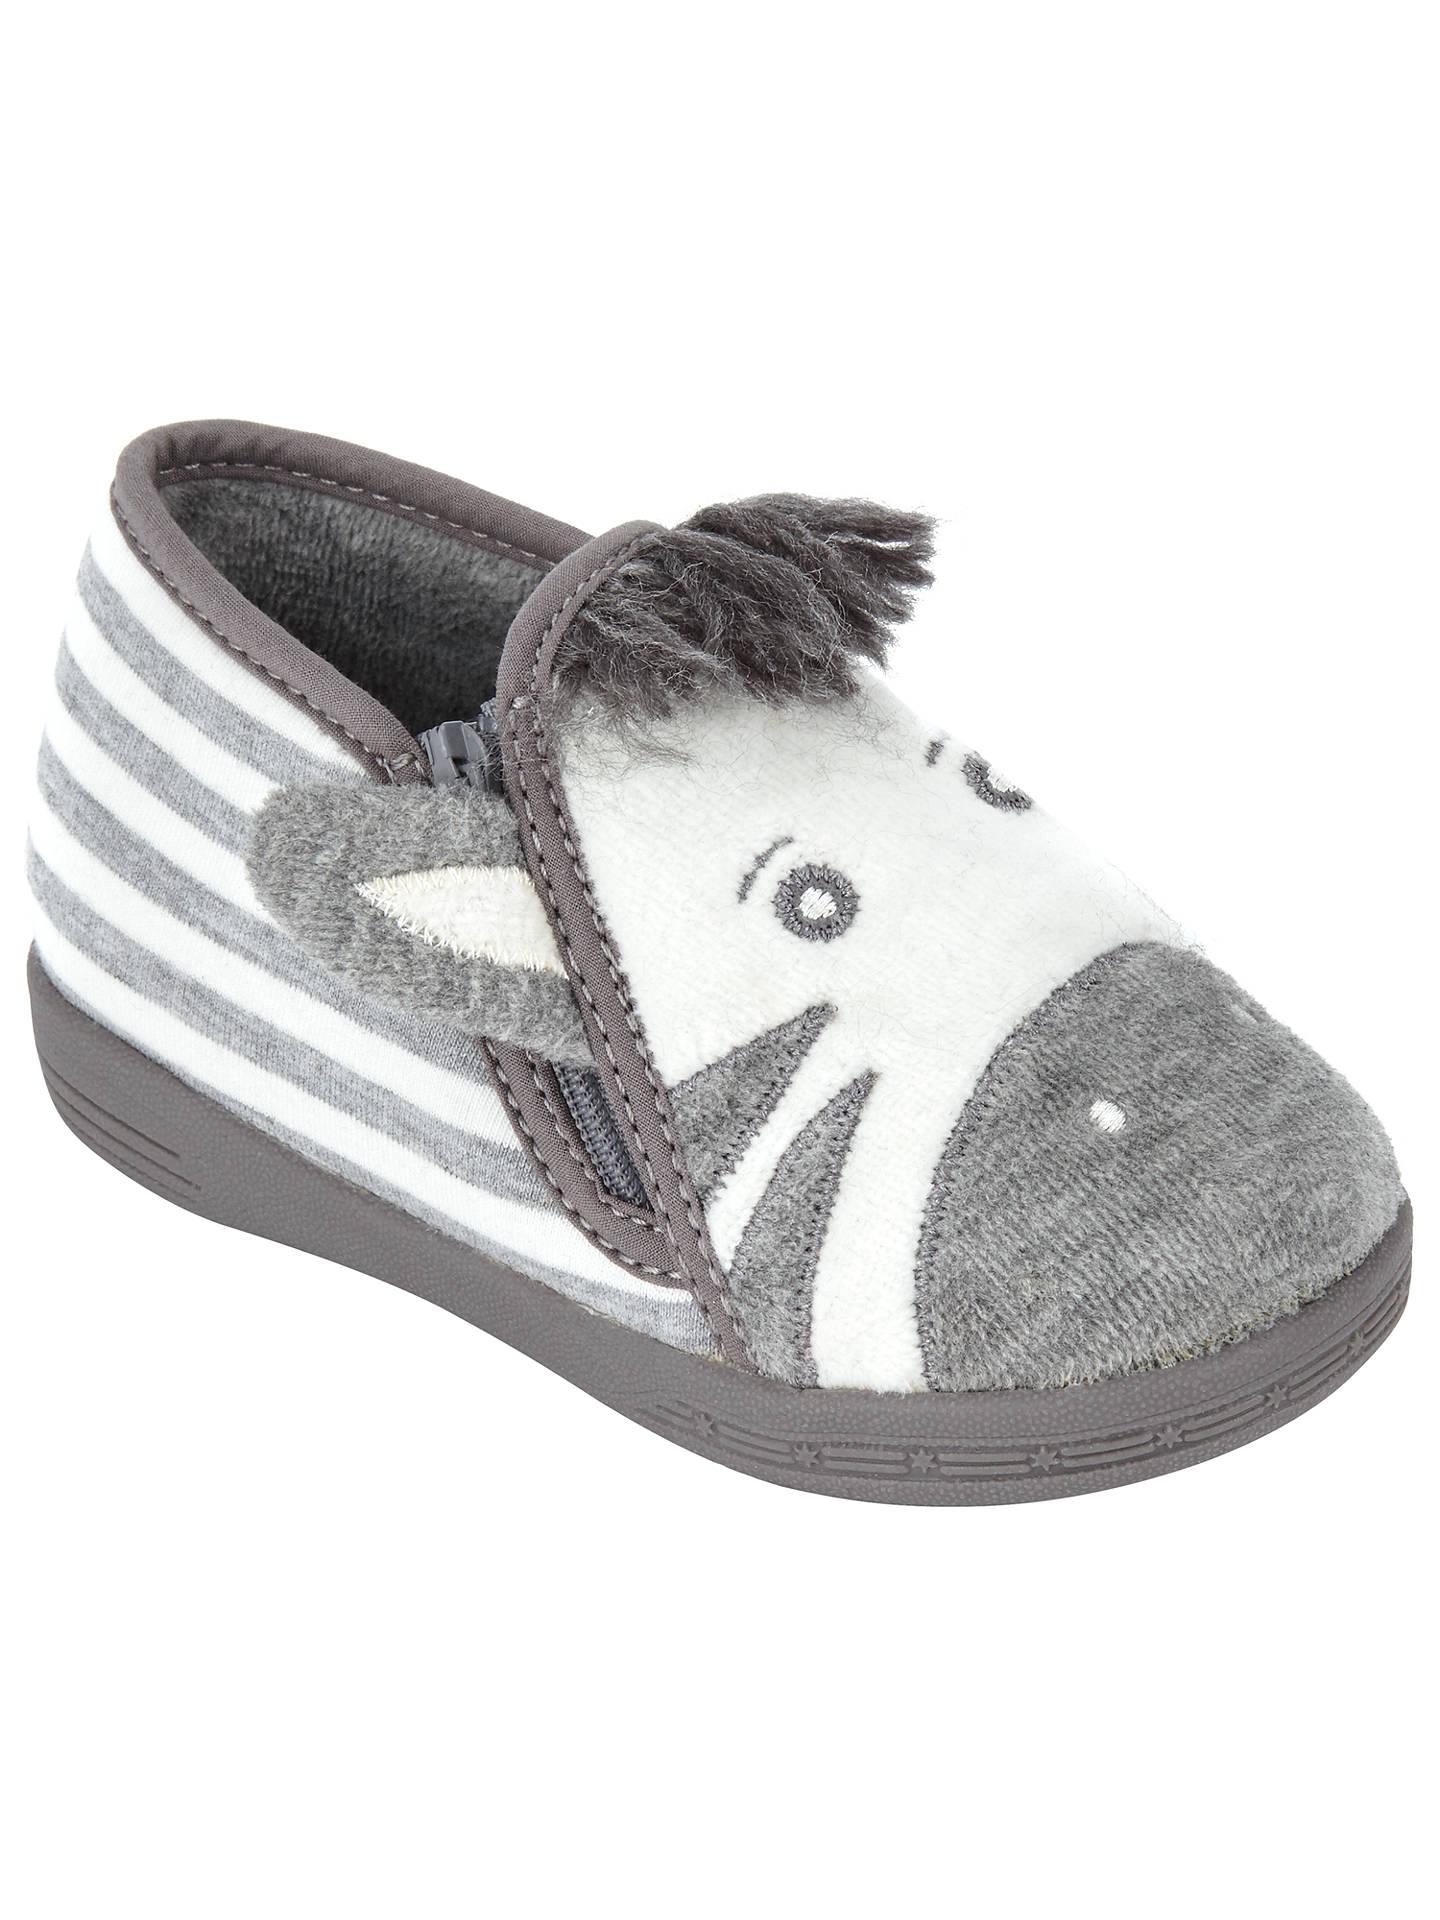 7eca892d3 Buy John Lewis   Partners Baby Zebra Slippers